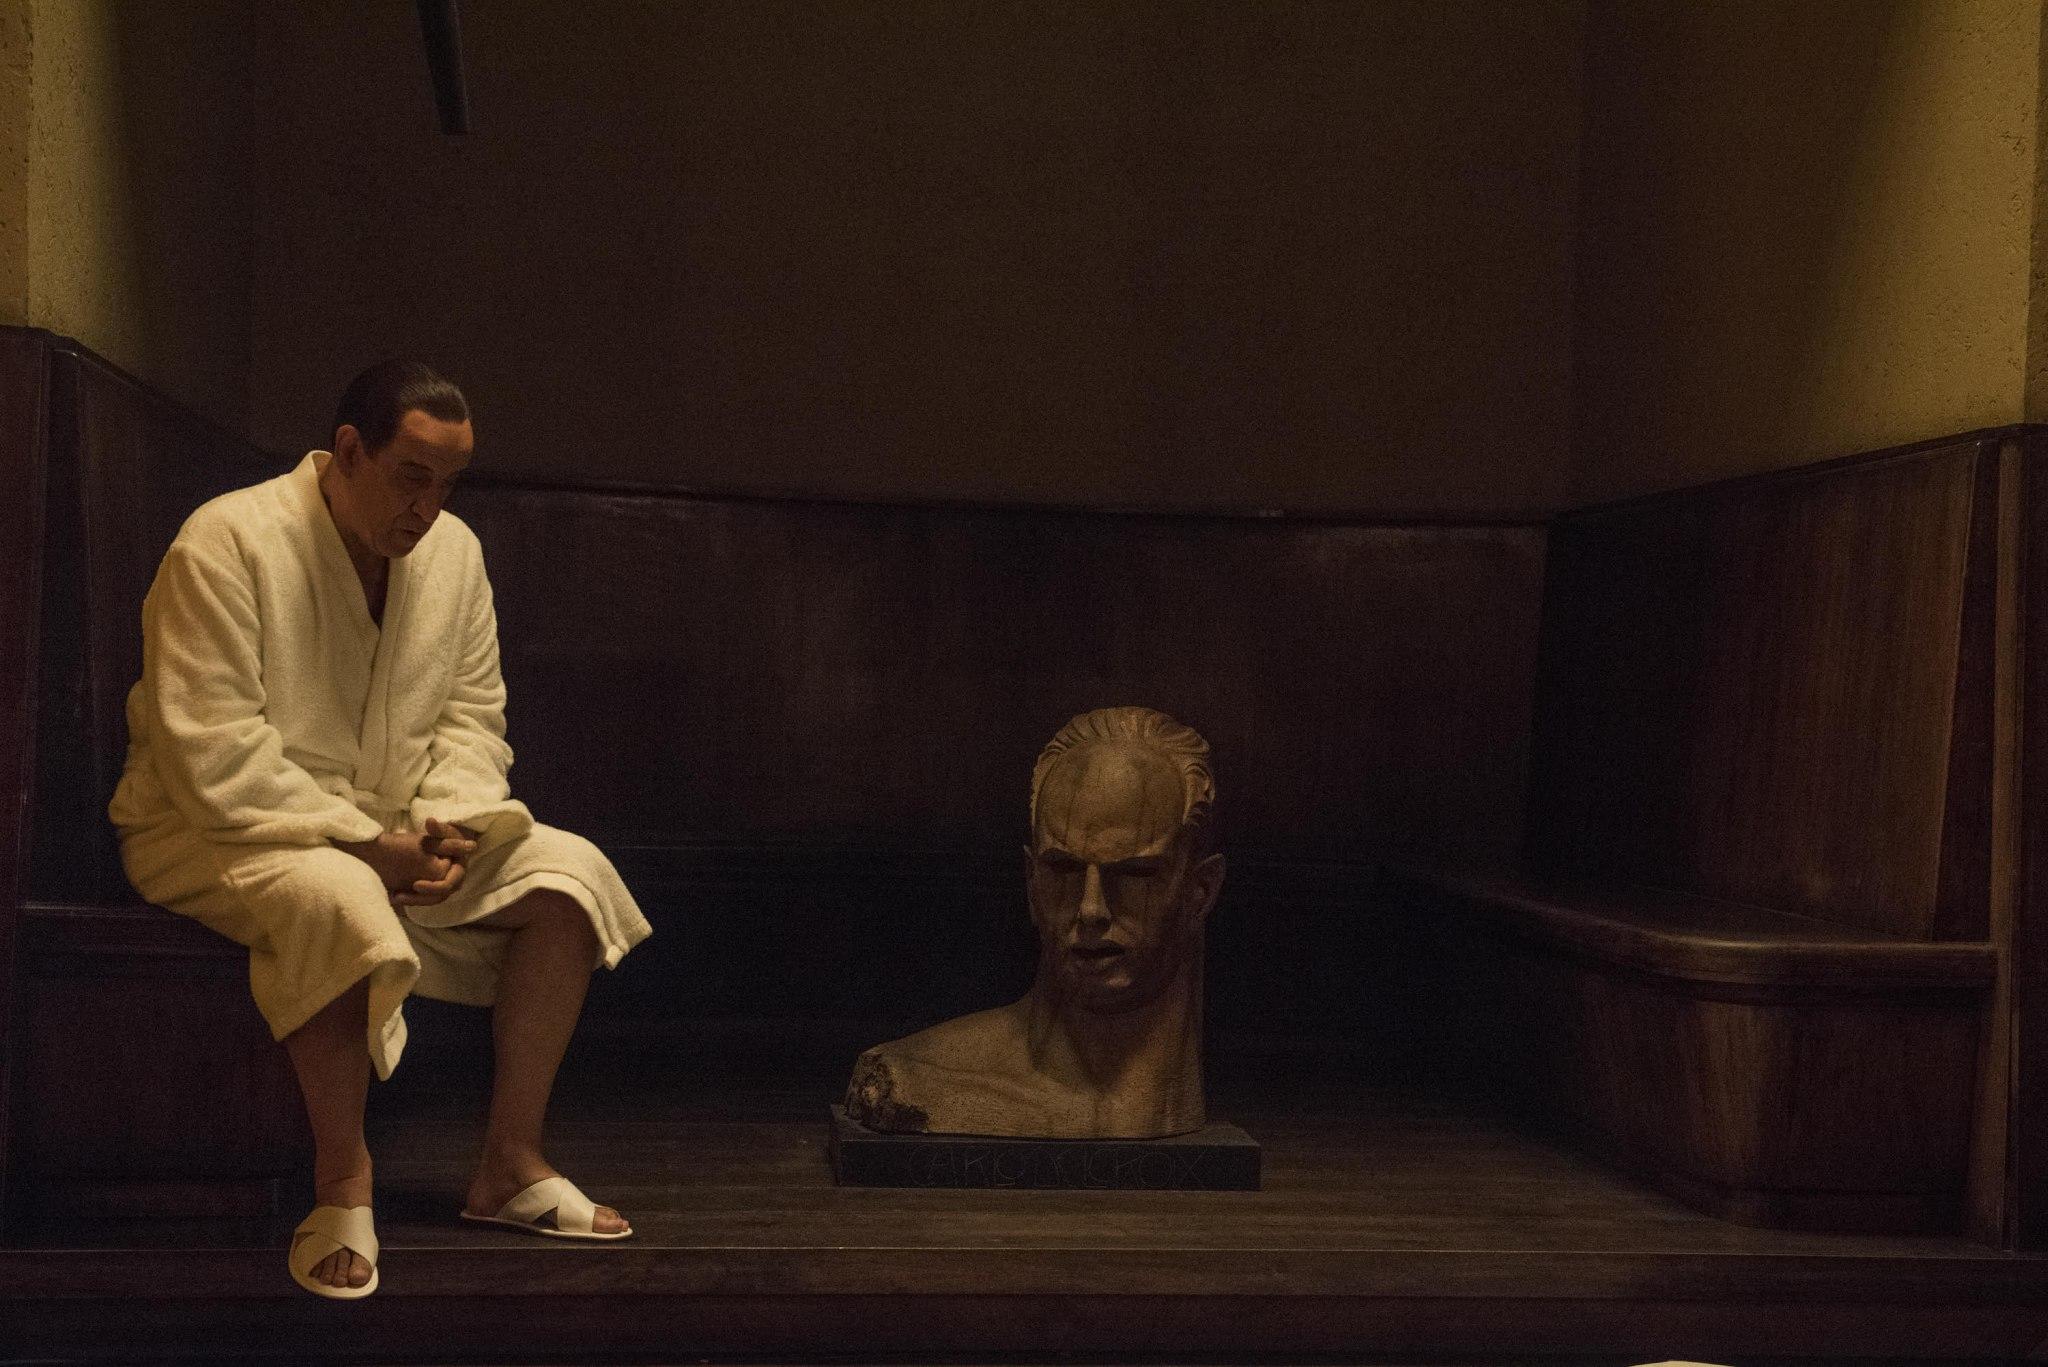 Filma Silvio (Loro, 2018)